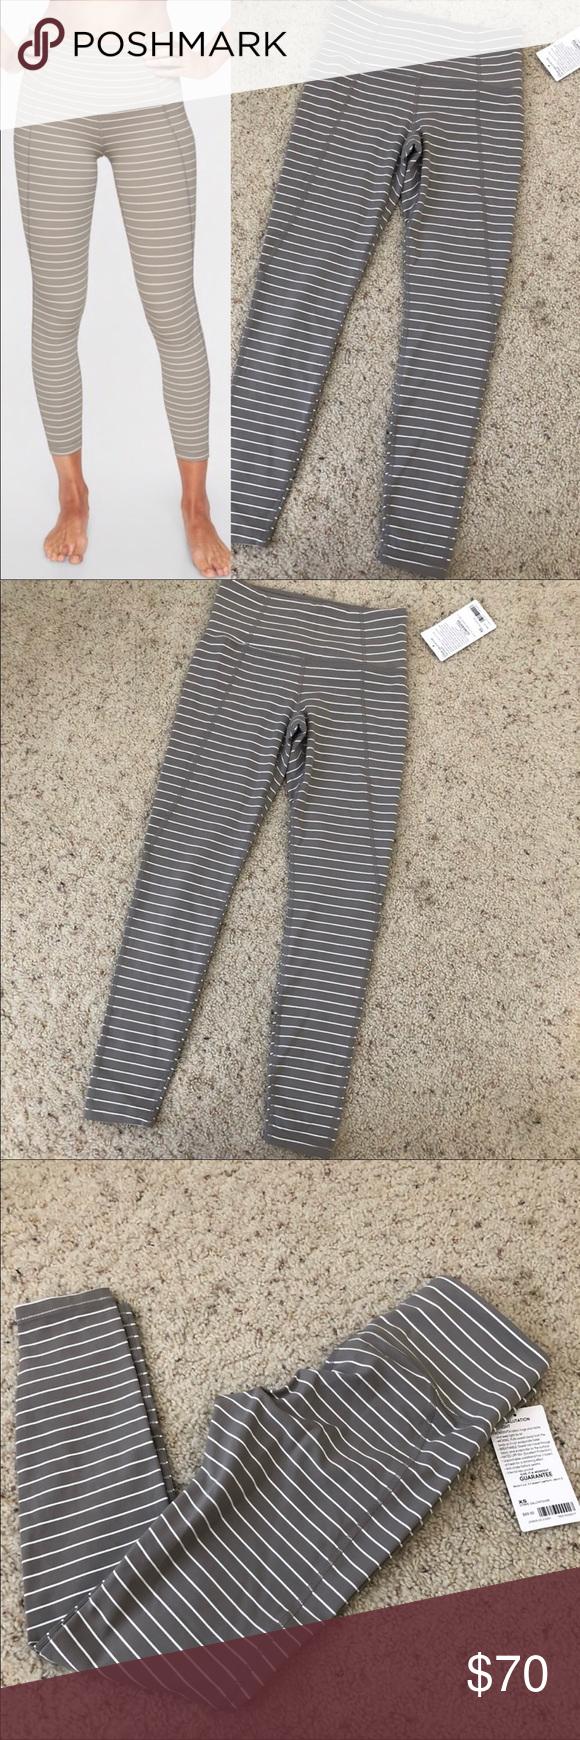 73d43bc227c0f Athleta Stripe Salutation 7/8 Tight NWT Size XSMALL Silver grey stripe  (actually more tan) High rise 7/8 length Powervita Athleta Pants Leggings